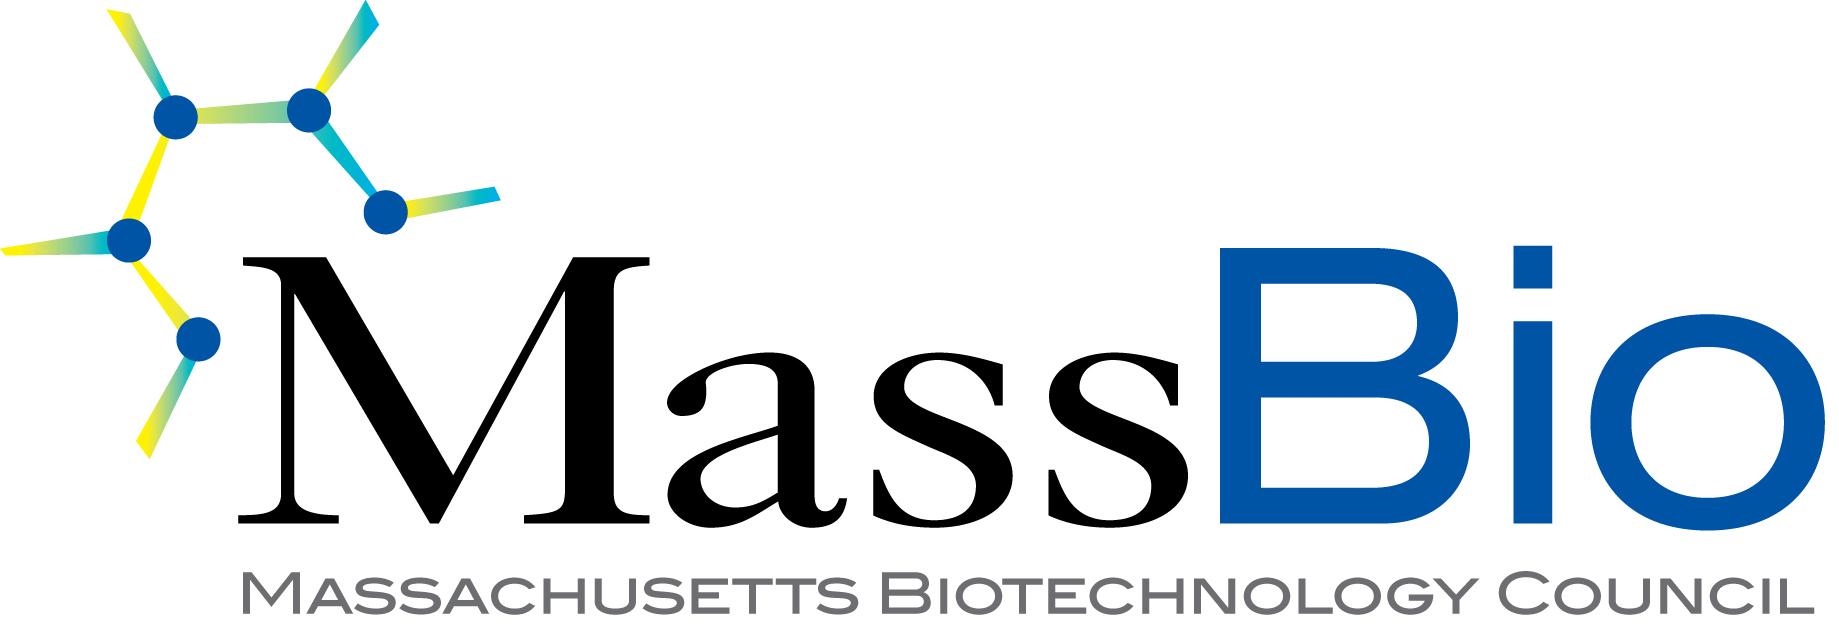 massbio-logo.jpg